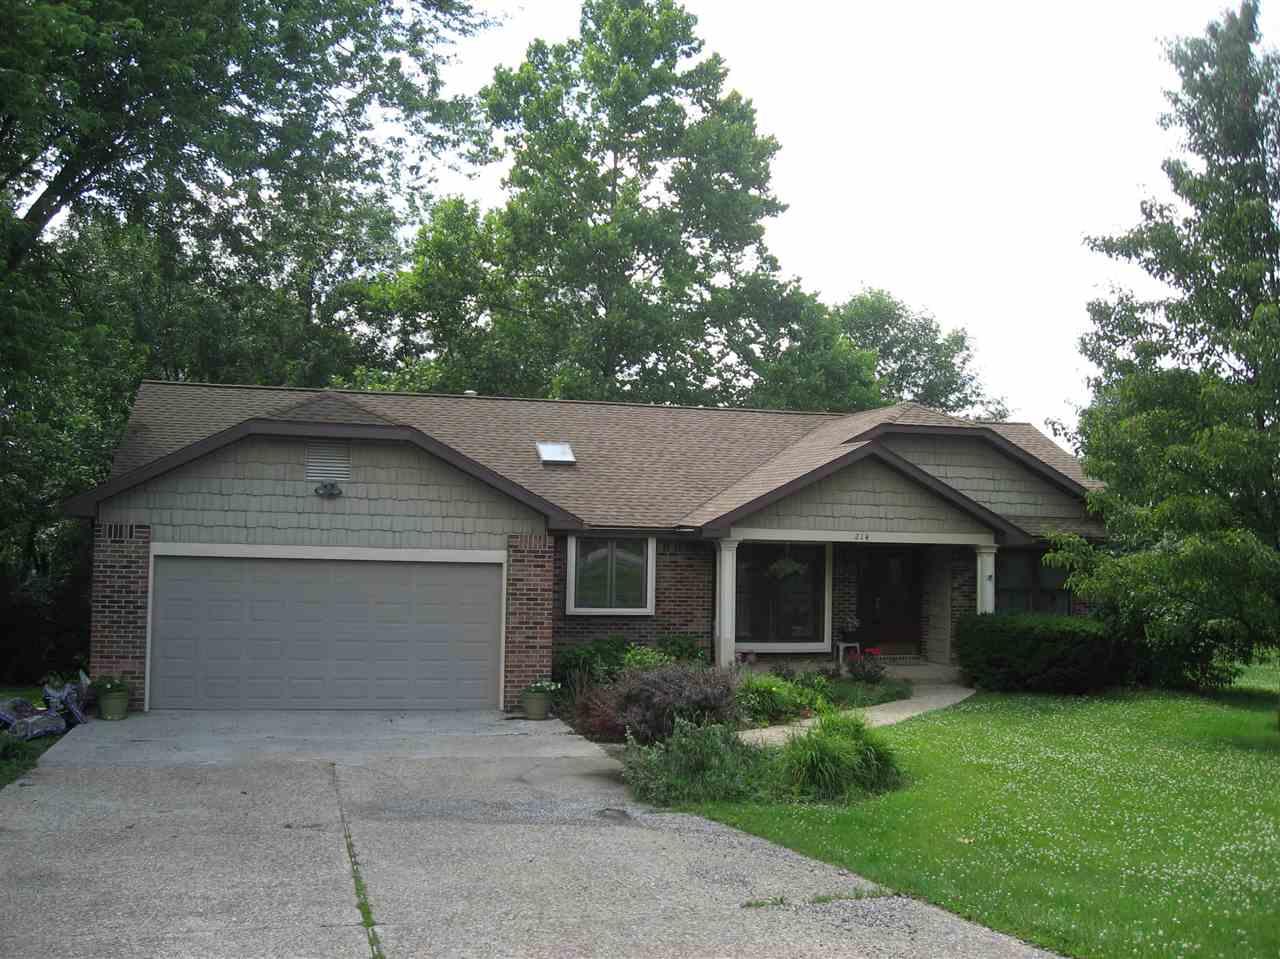 Real Estate for Sale, ListingId: 32945686, MacOmb,IL61455